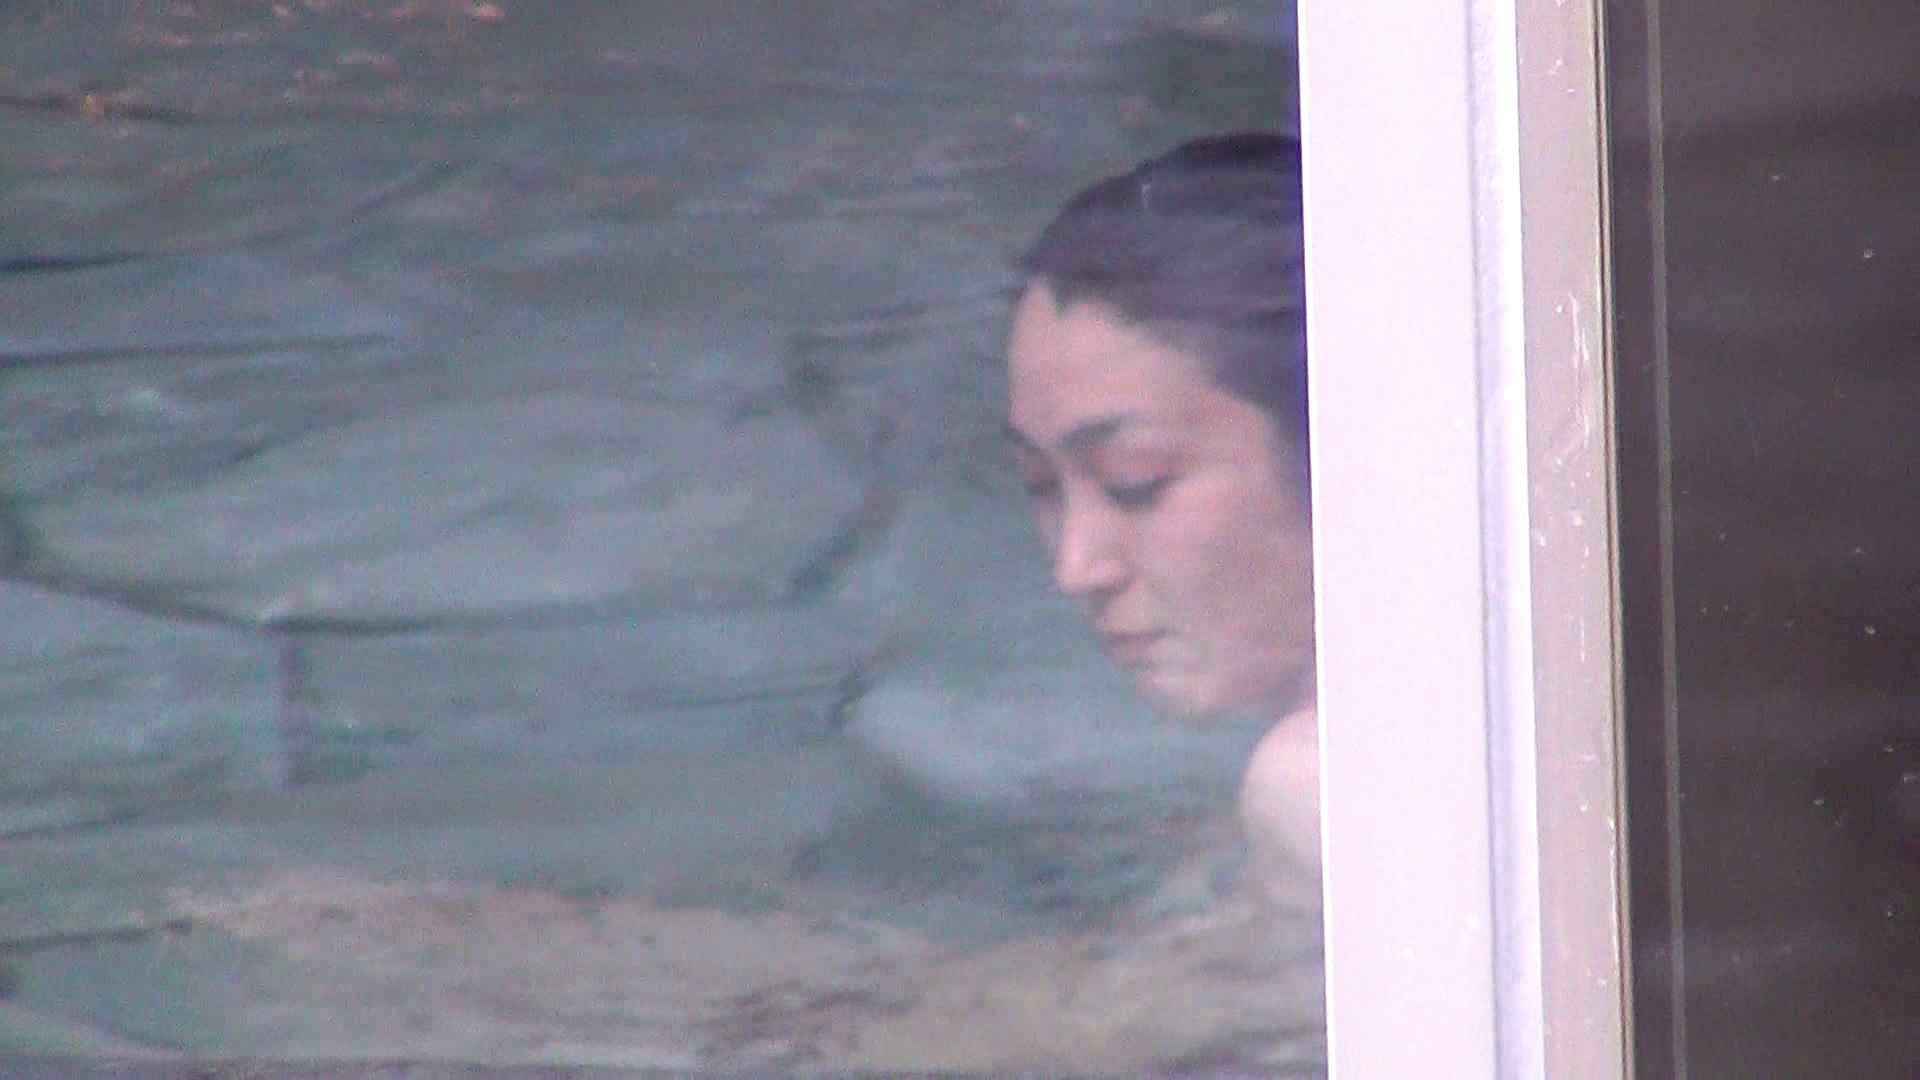 Aquaな露天風呂Vol.290 0 | 0  79連発 31